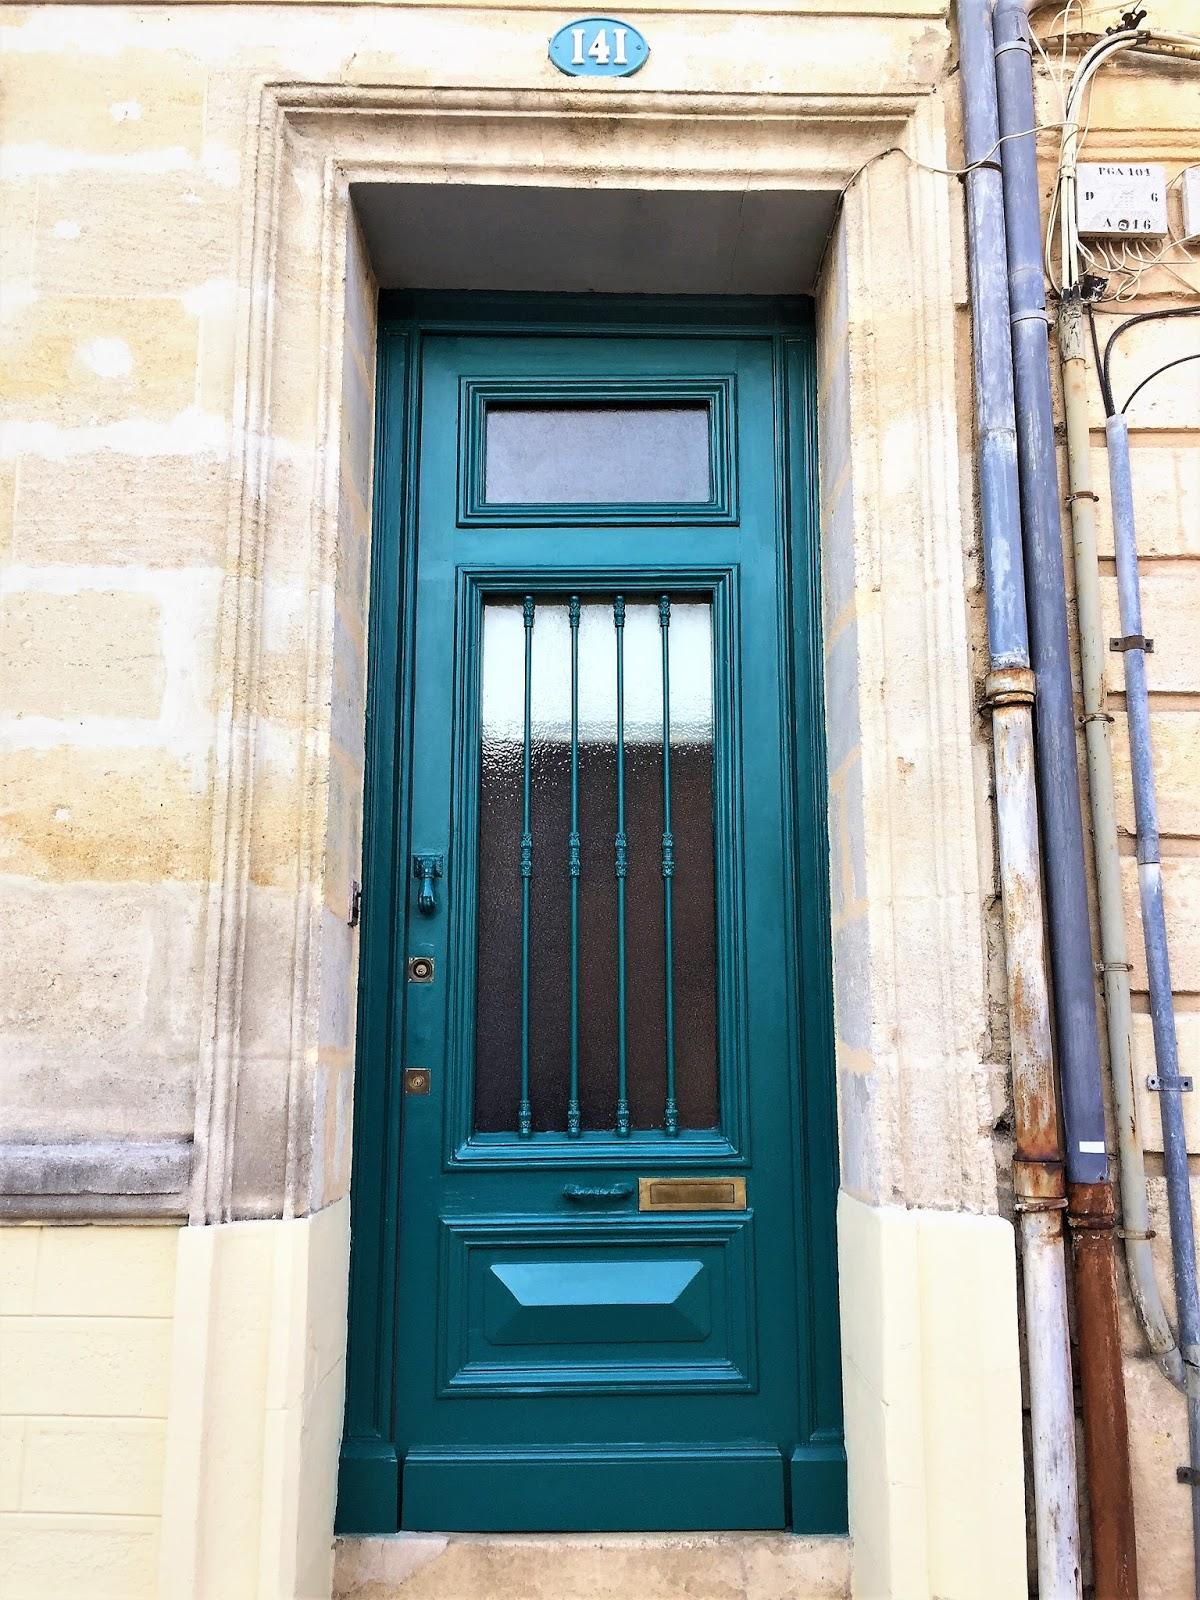 Cortigianerie porte e mascarons di bordeaux for Porte e porte